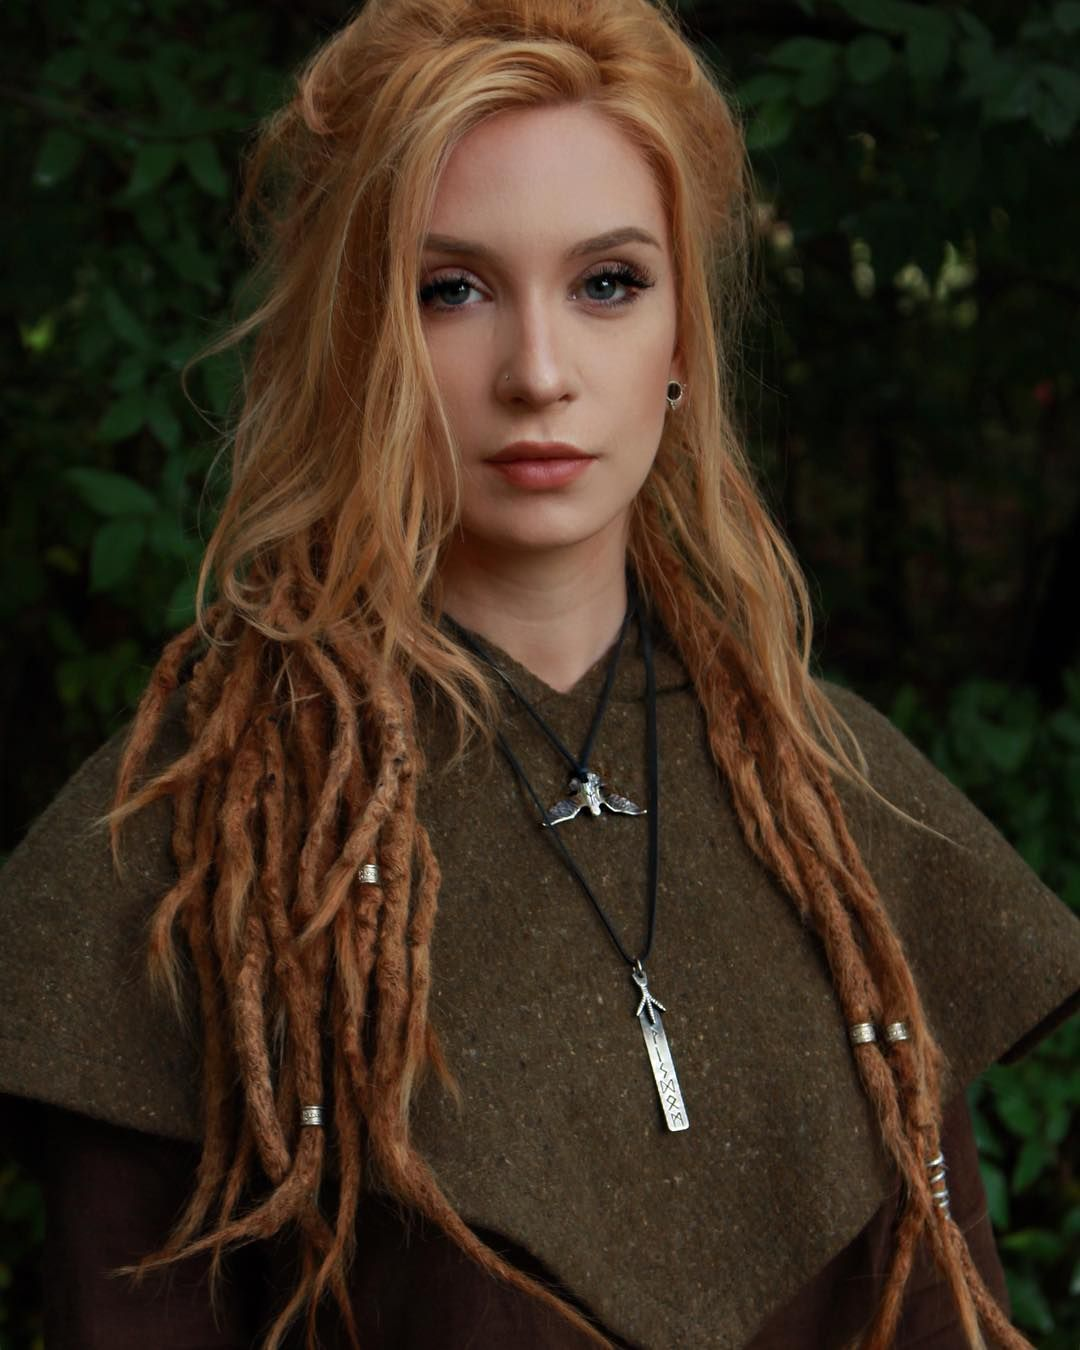 viking hair hair styles hair et dreads. Black Bedroom Furniture Sets. Home Design Ideas